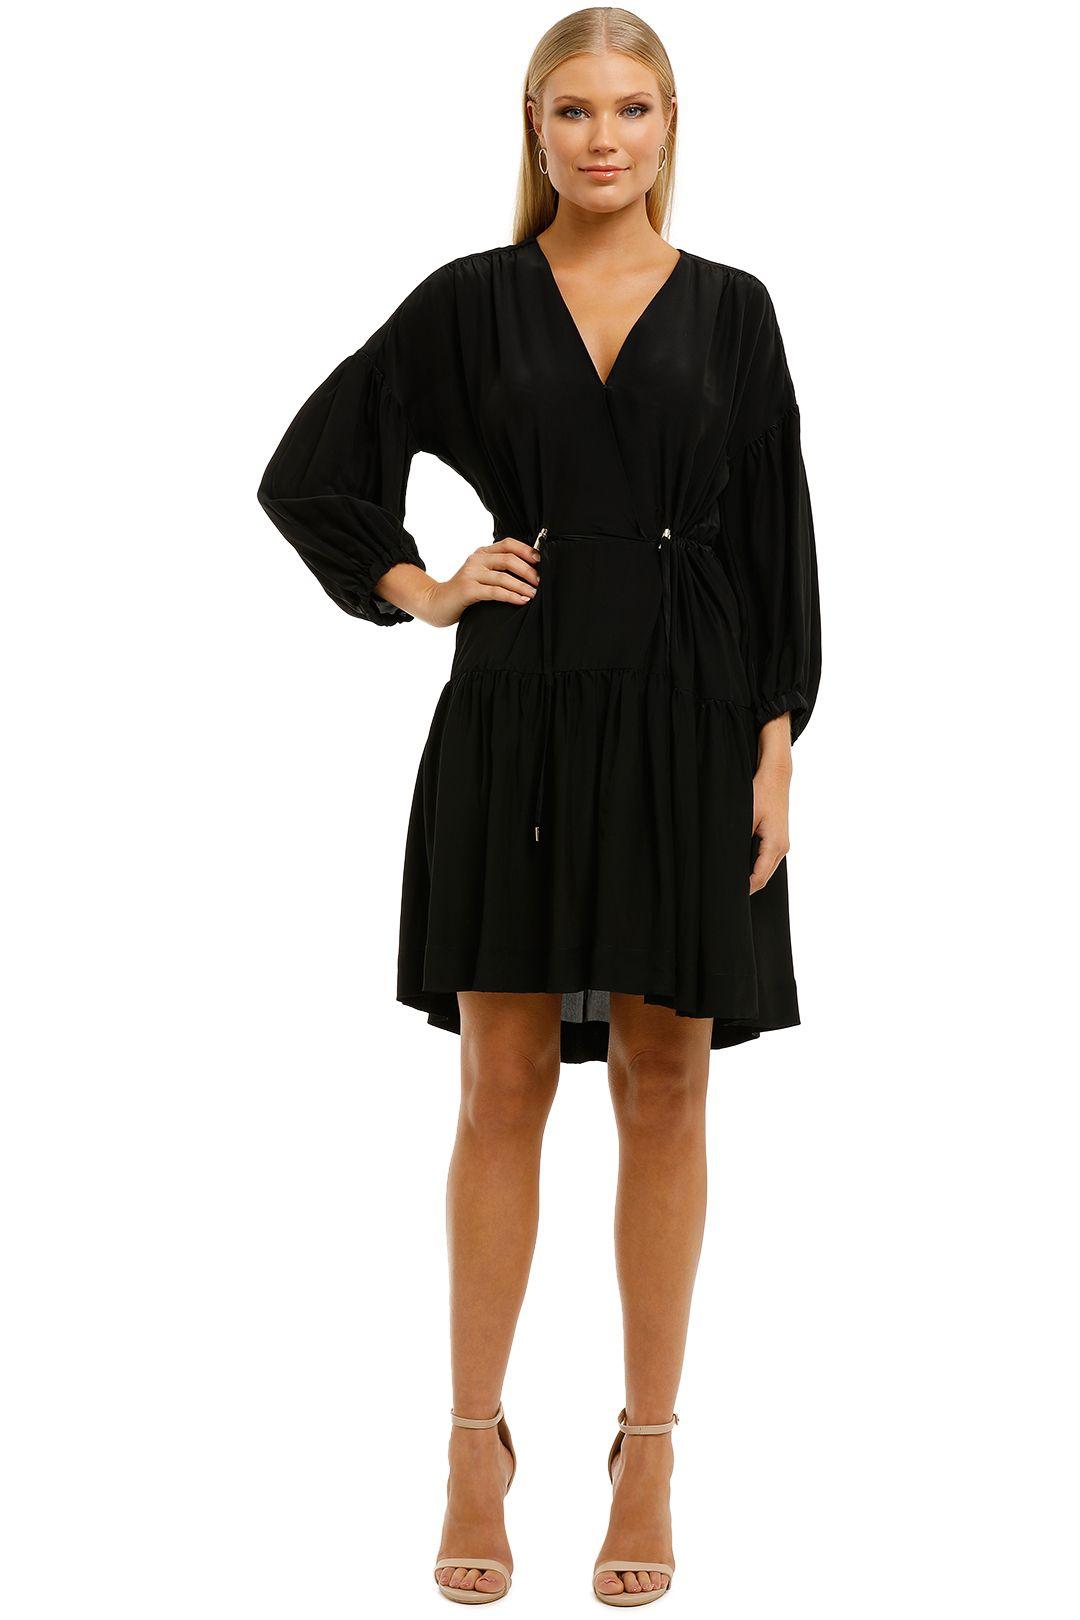 Ginger-and-Smart-Whisper-Dress-Black-Front